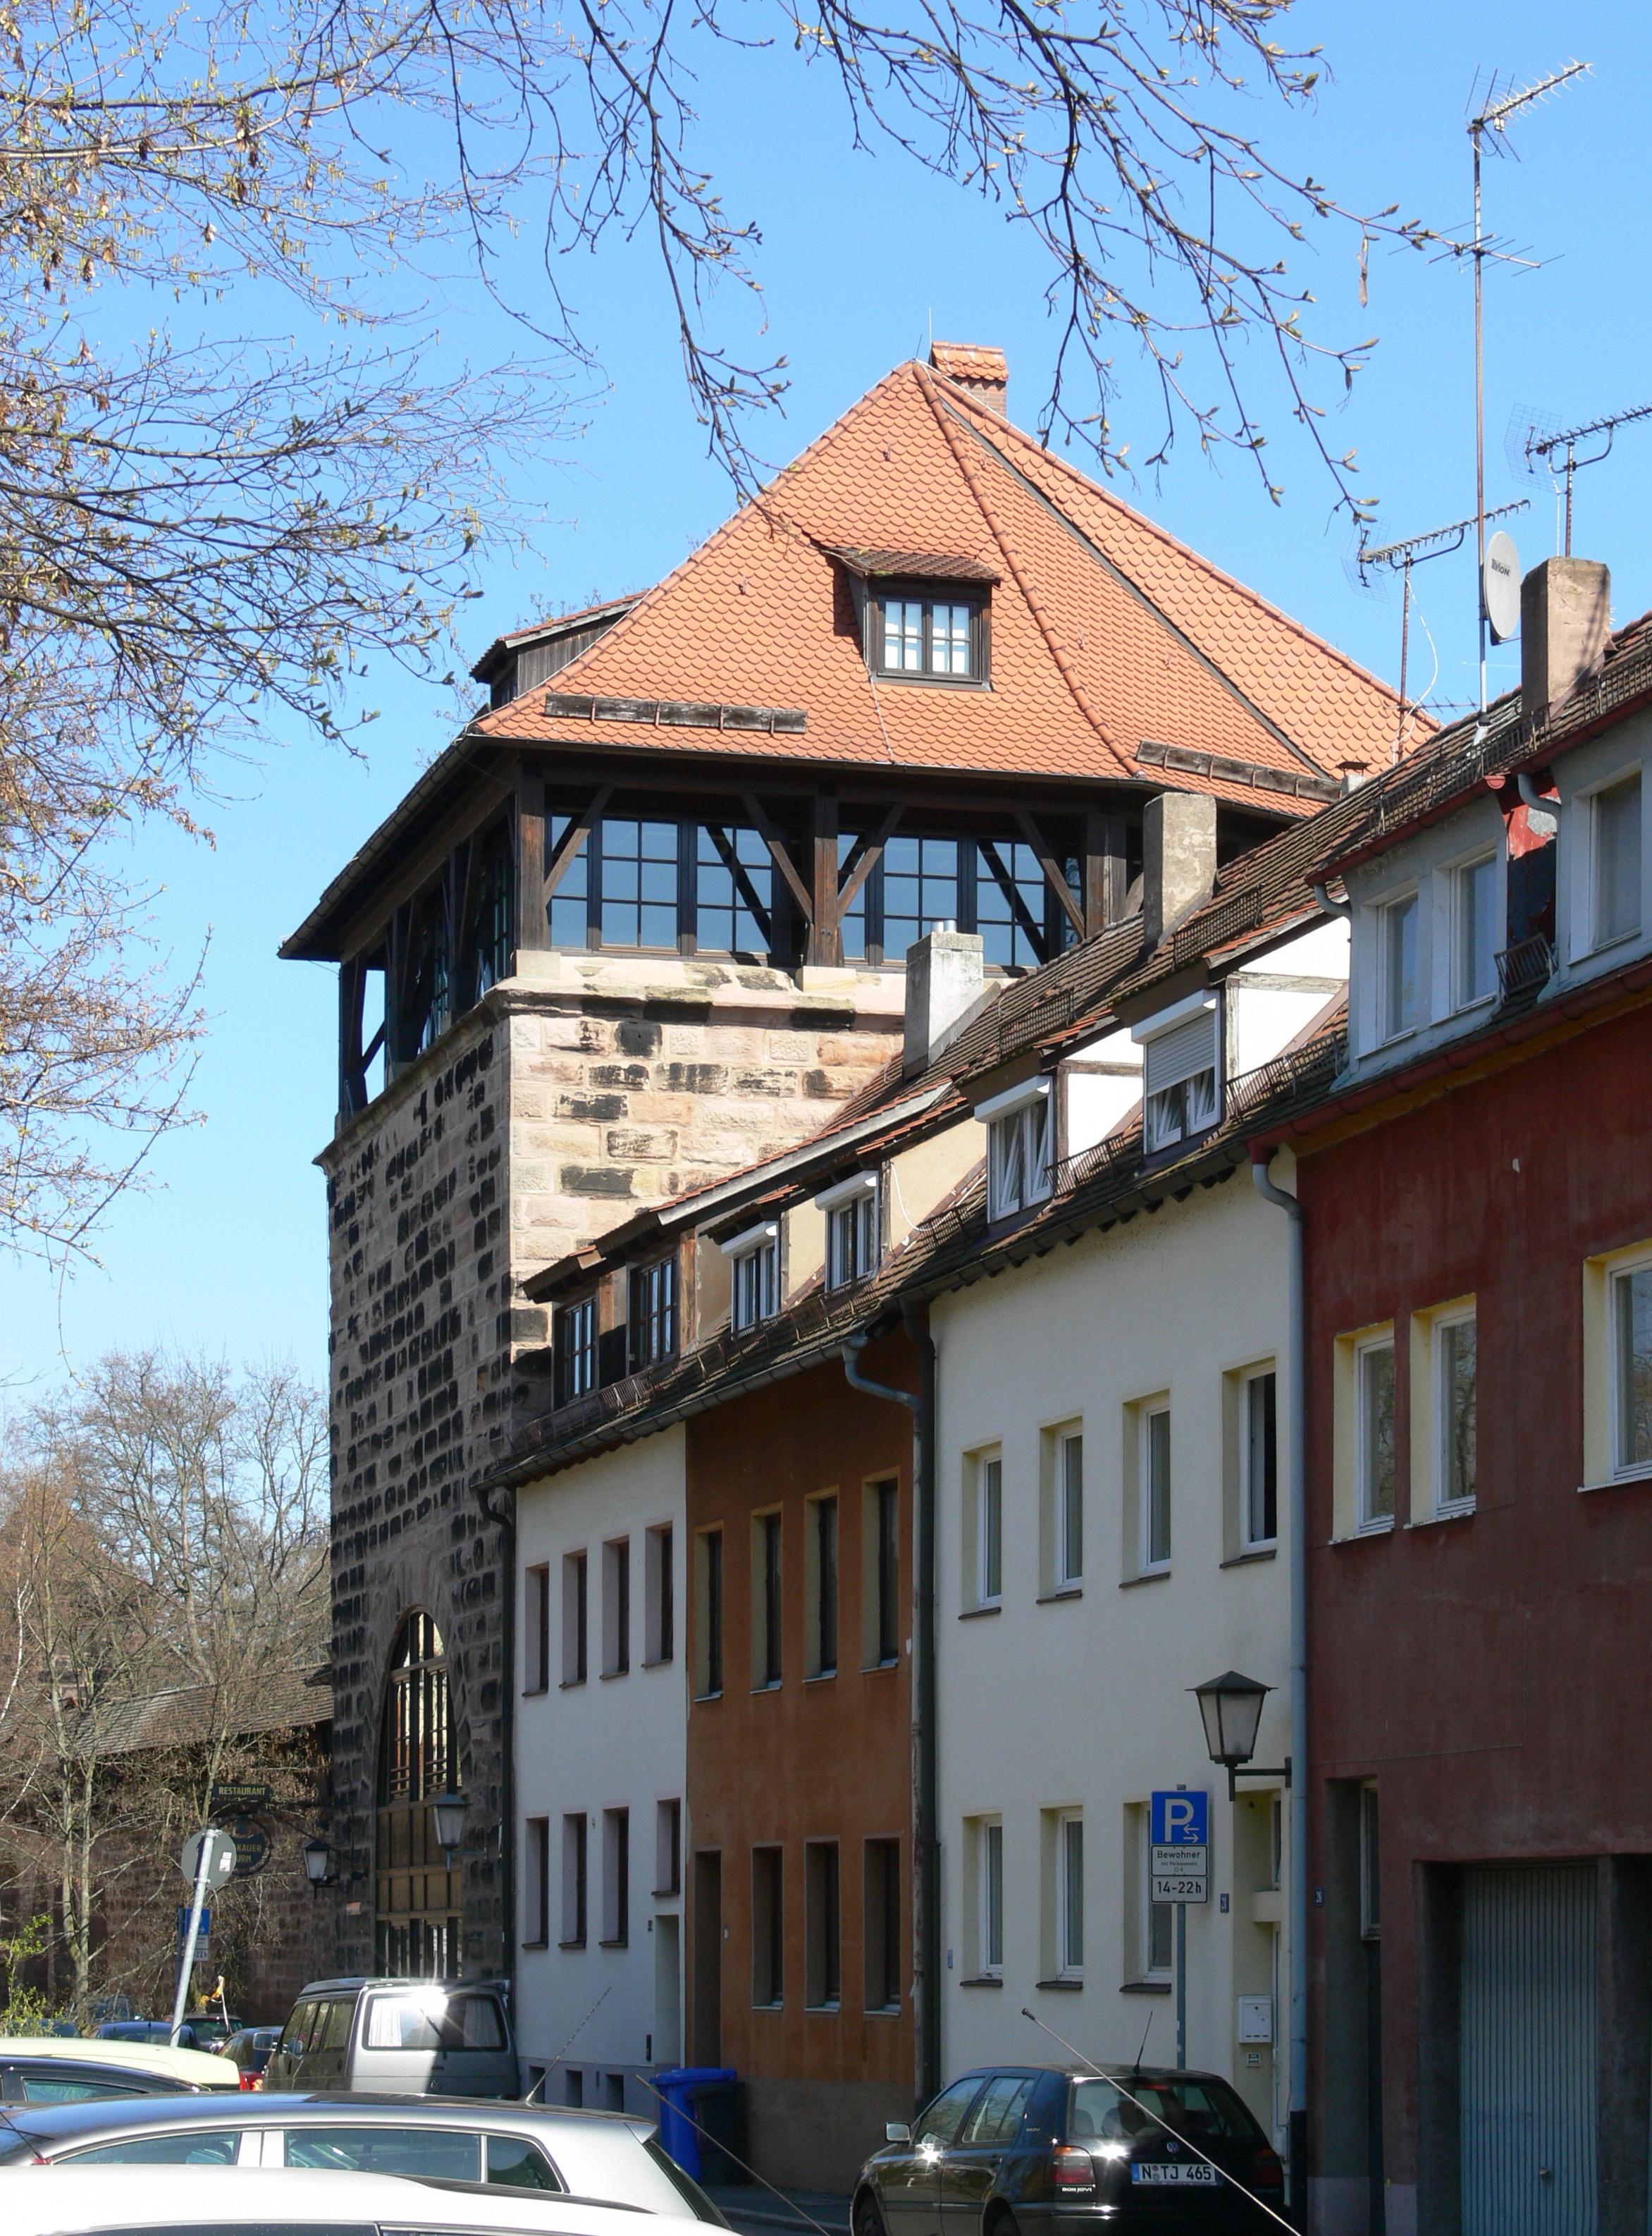 Inspirational Krakauer Haus Nürnberg